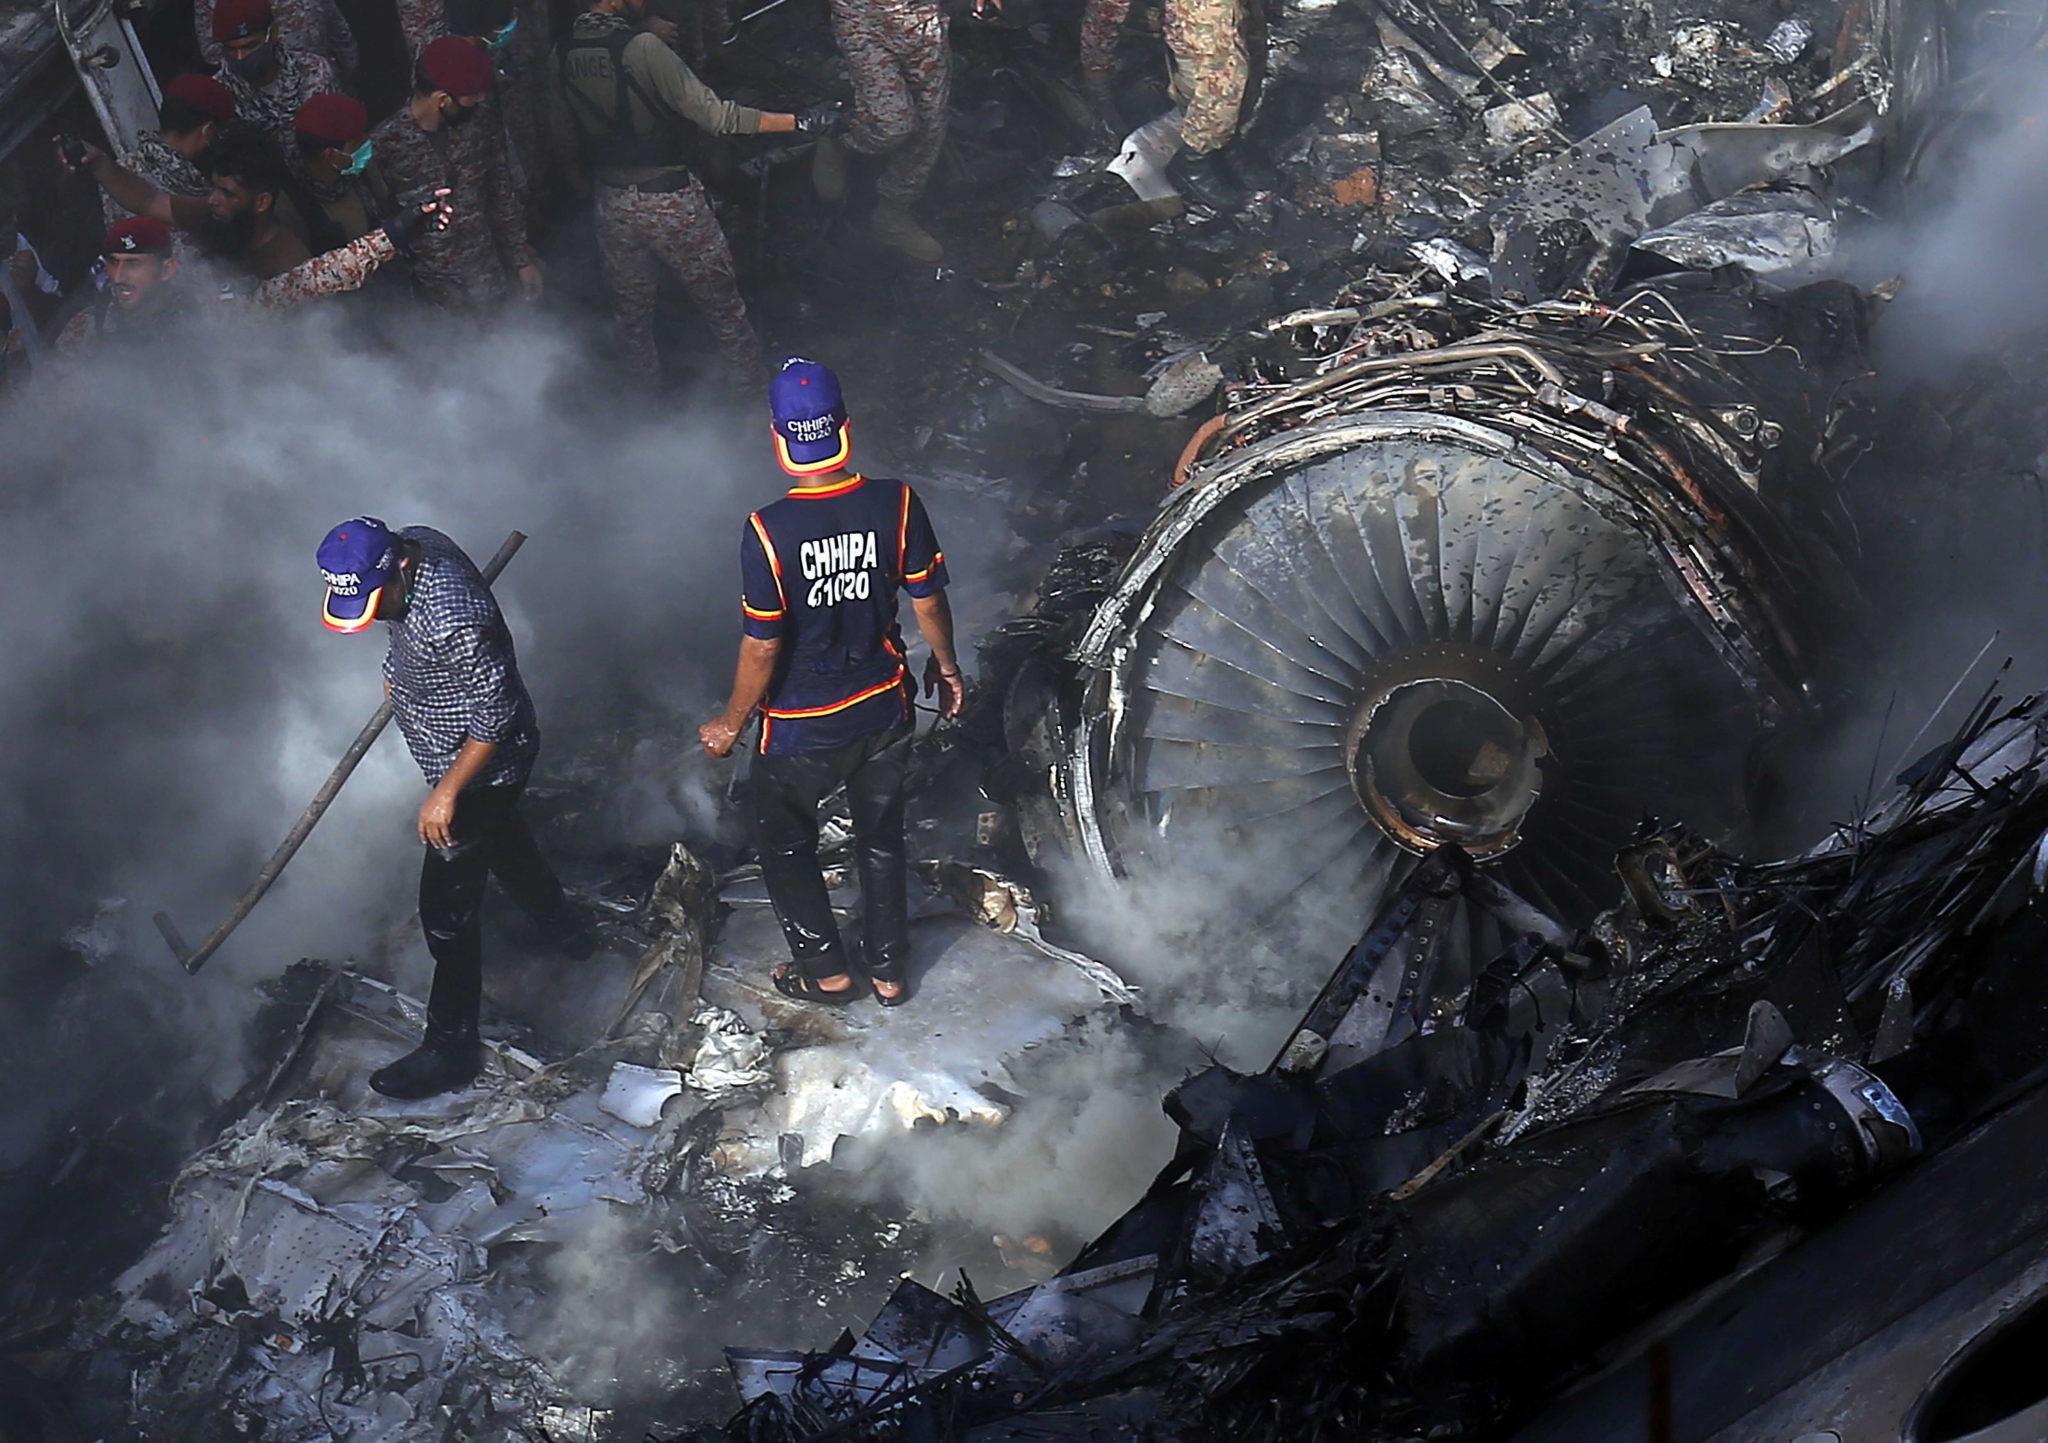 Wybuch samolotu w Karaczai. Fot. EPA/SHAHZAIB AKBER